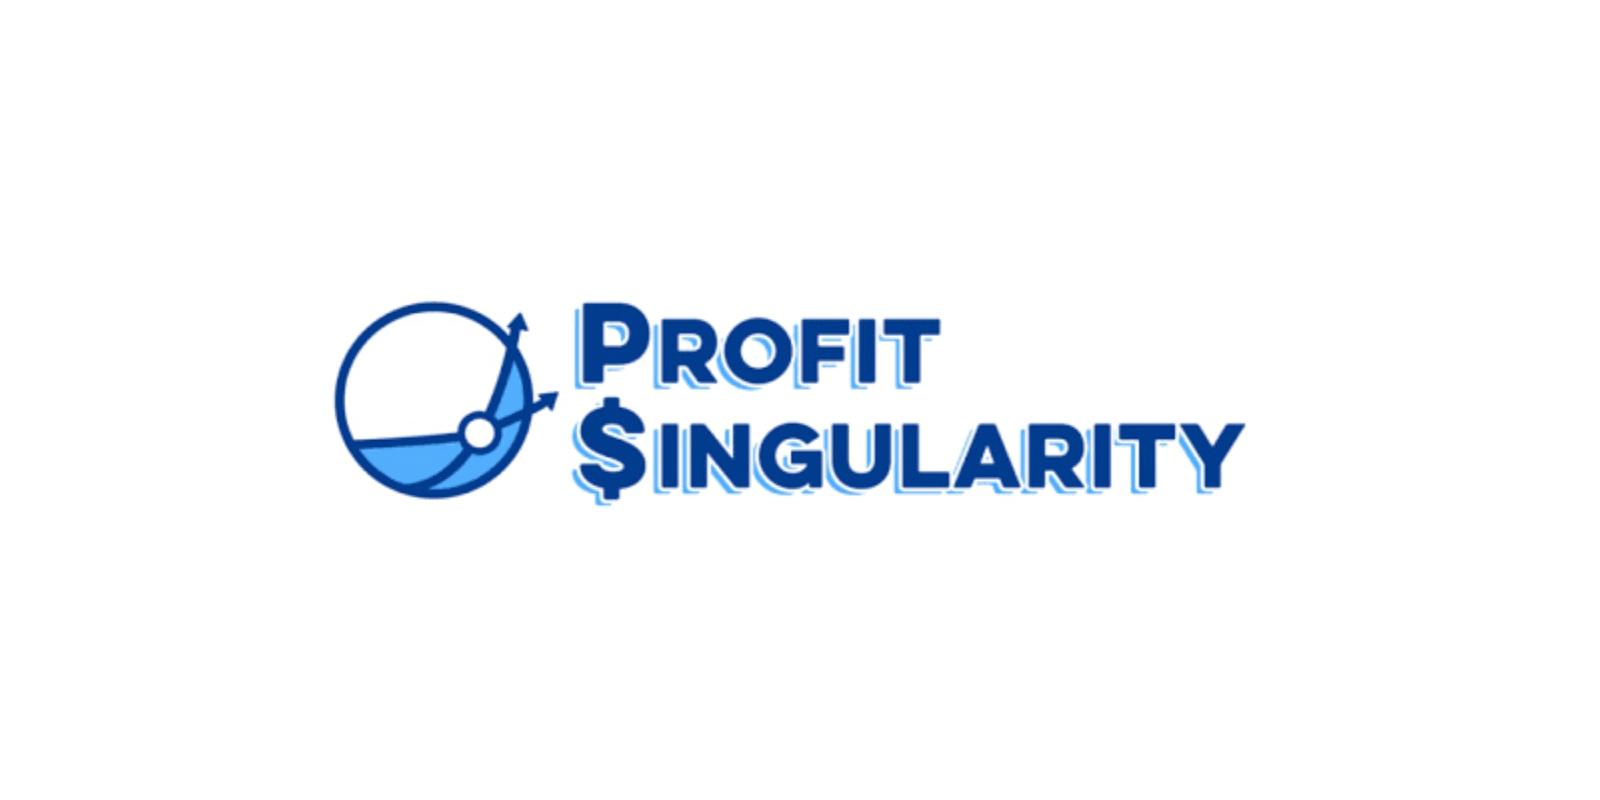 Profit-Singularity-Reviews